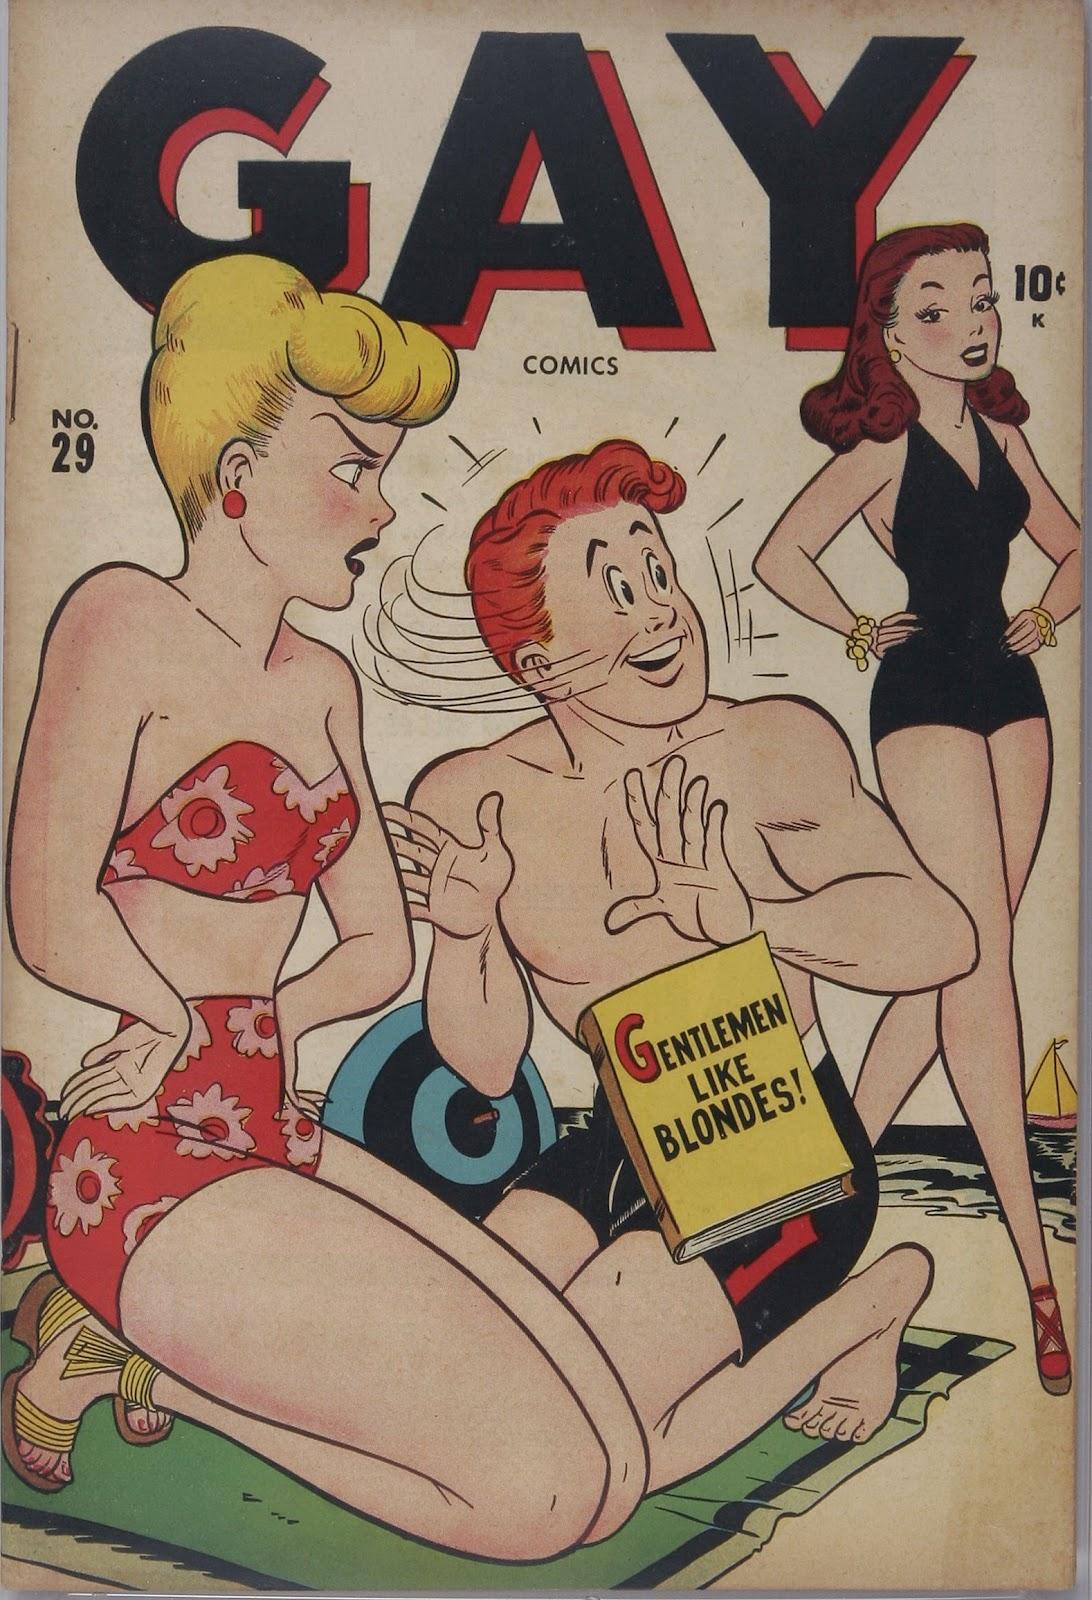 Read online Gay Comics comic -  Issue #29 - 1